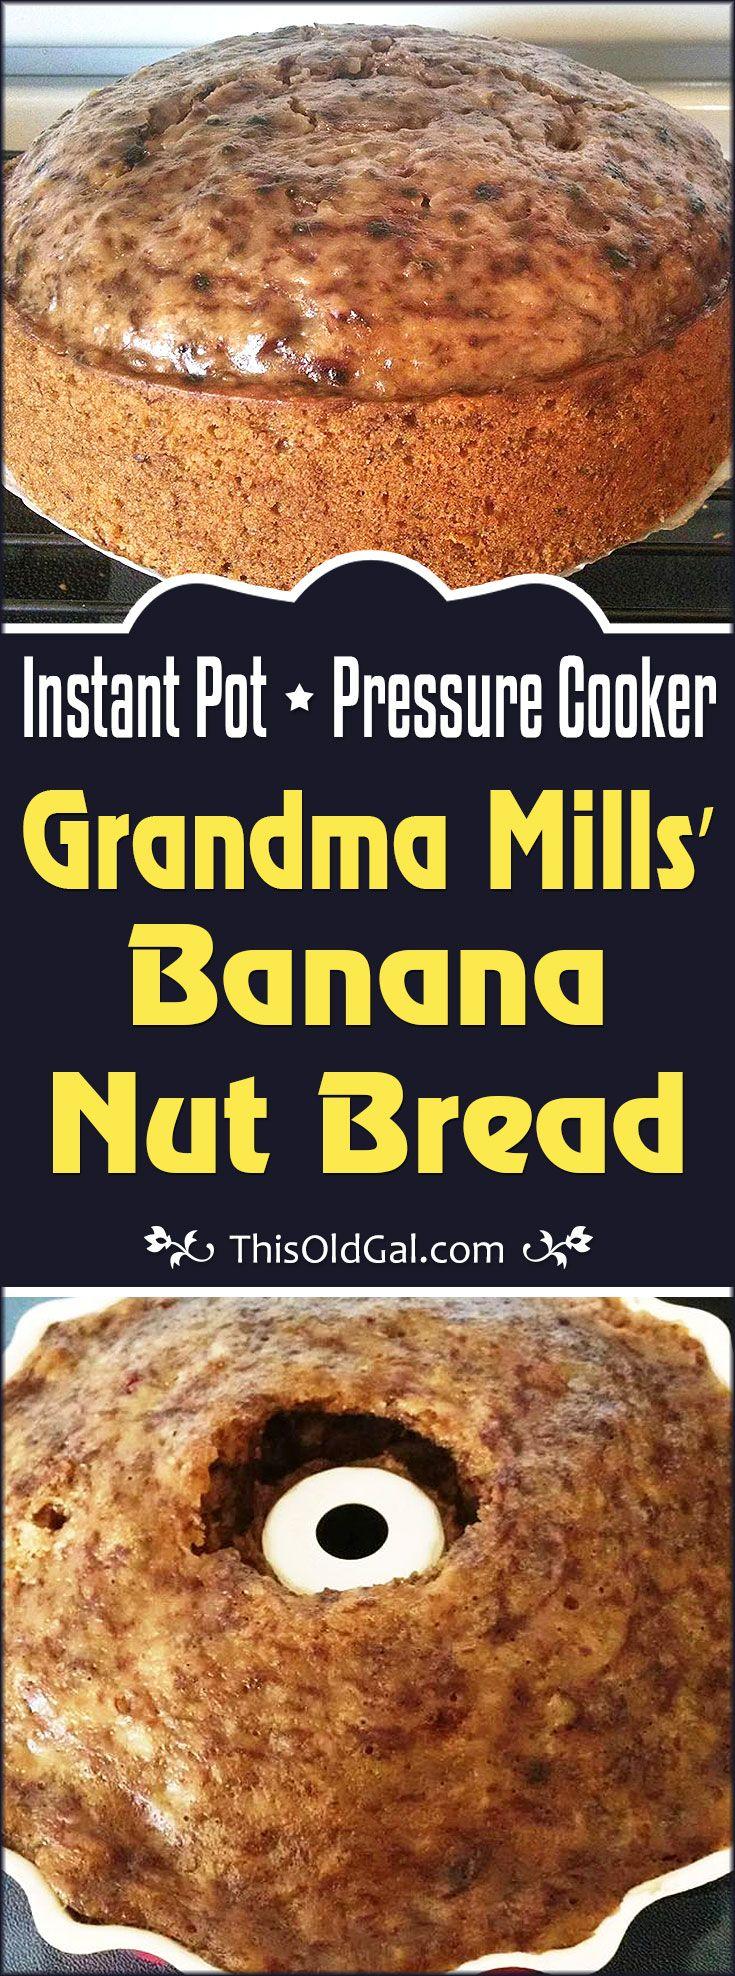 Instant Pot Pressure Cooker Grandma Mills' Banana Nut Bread Image